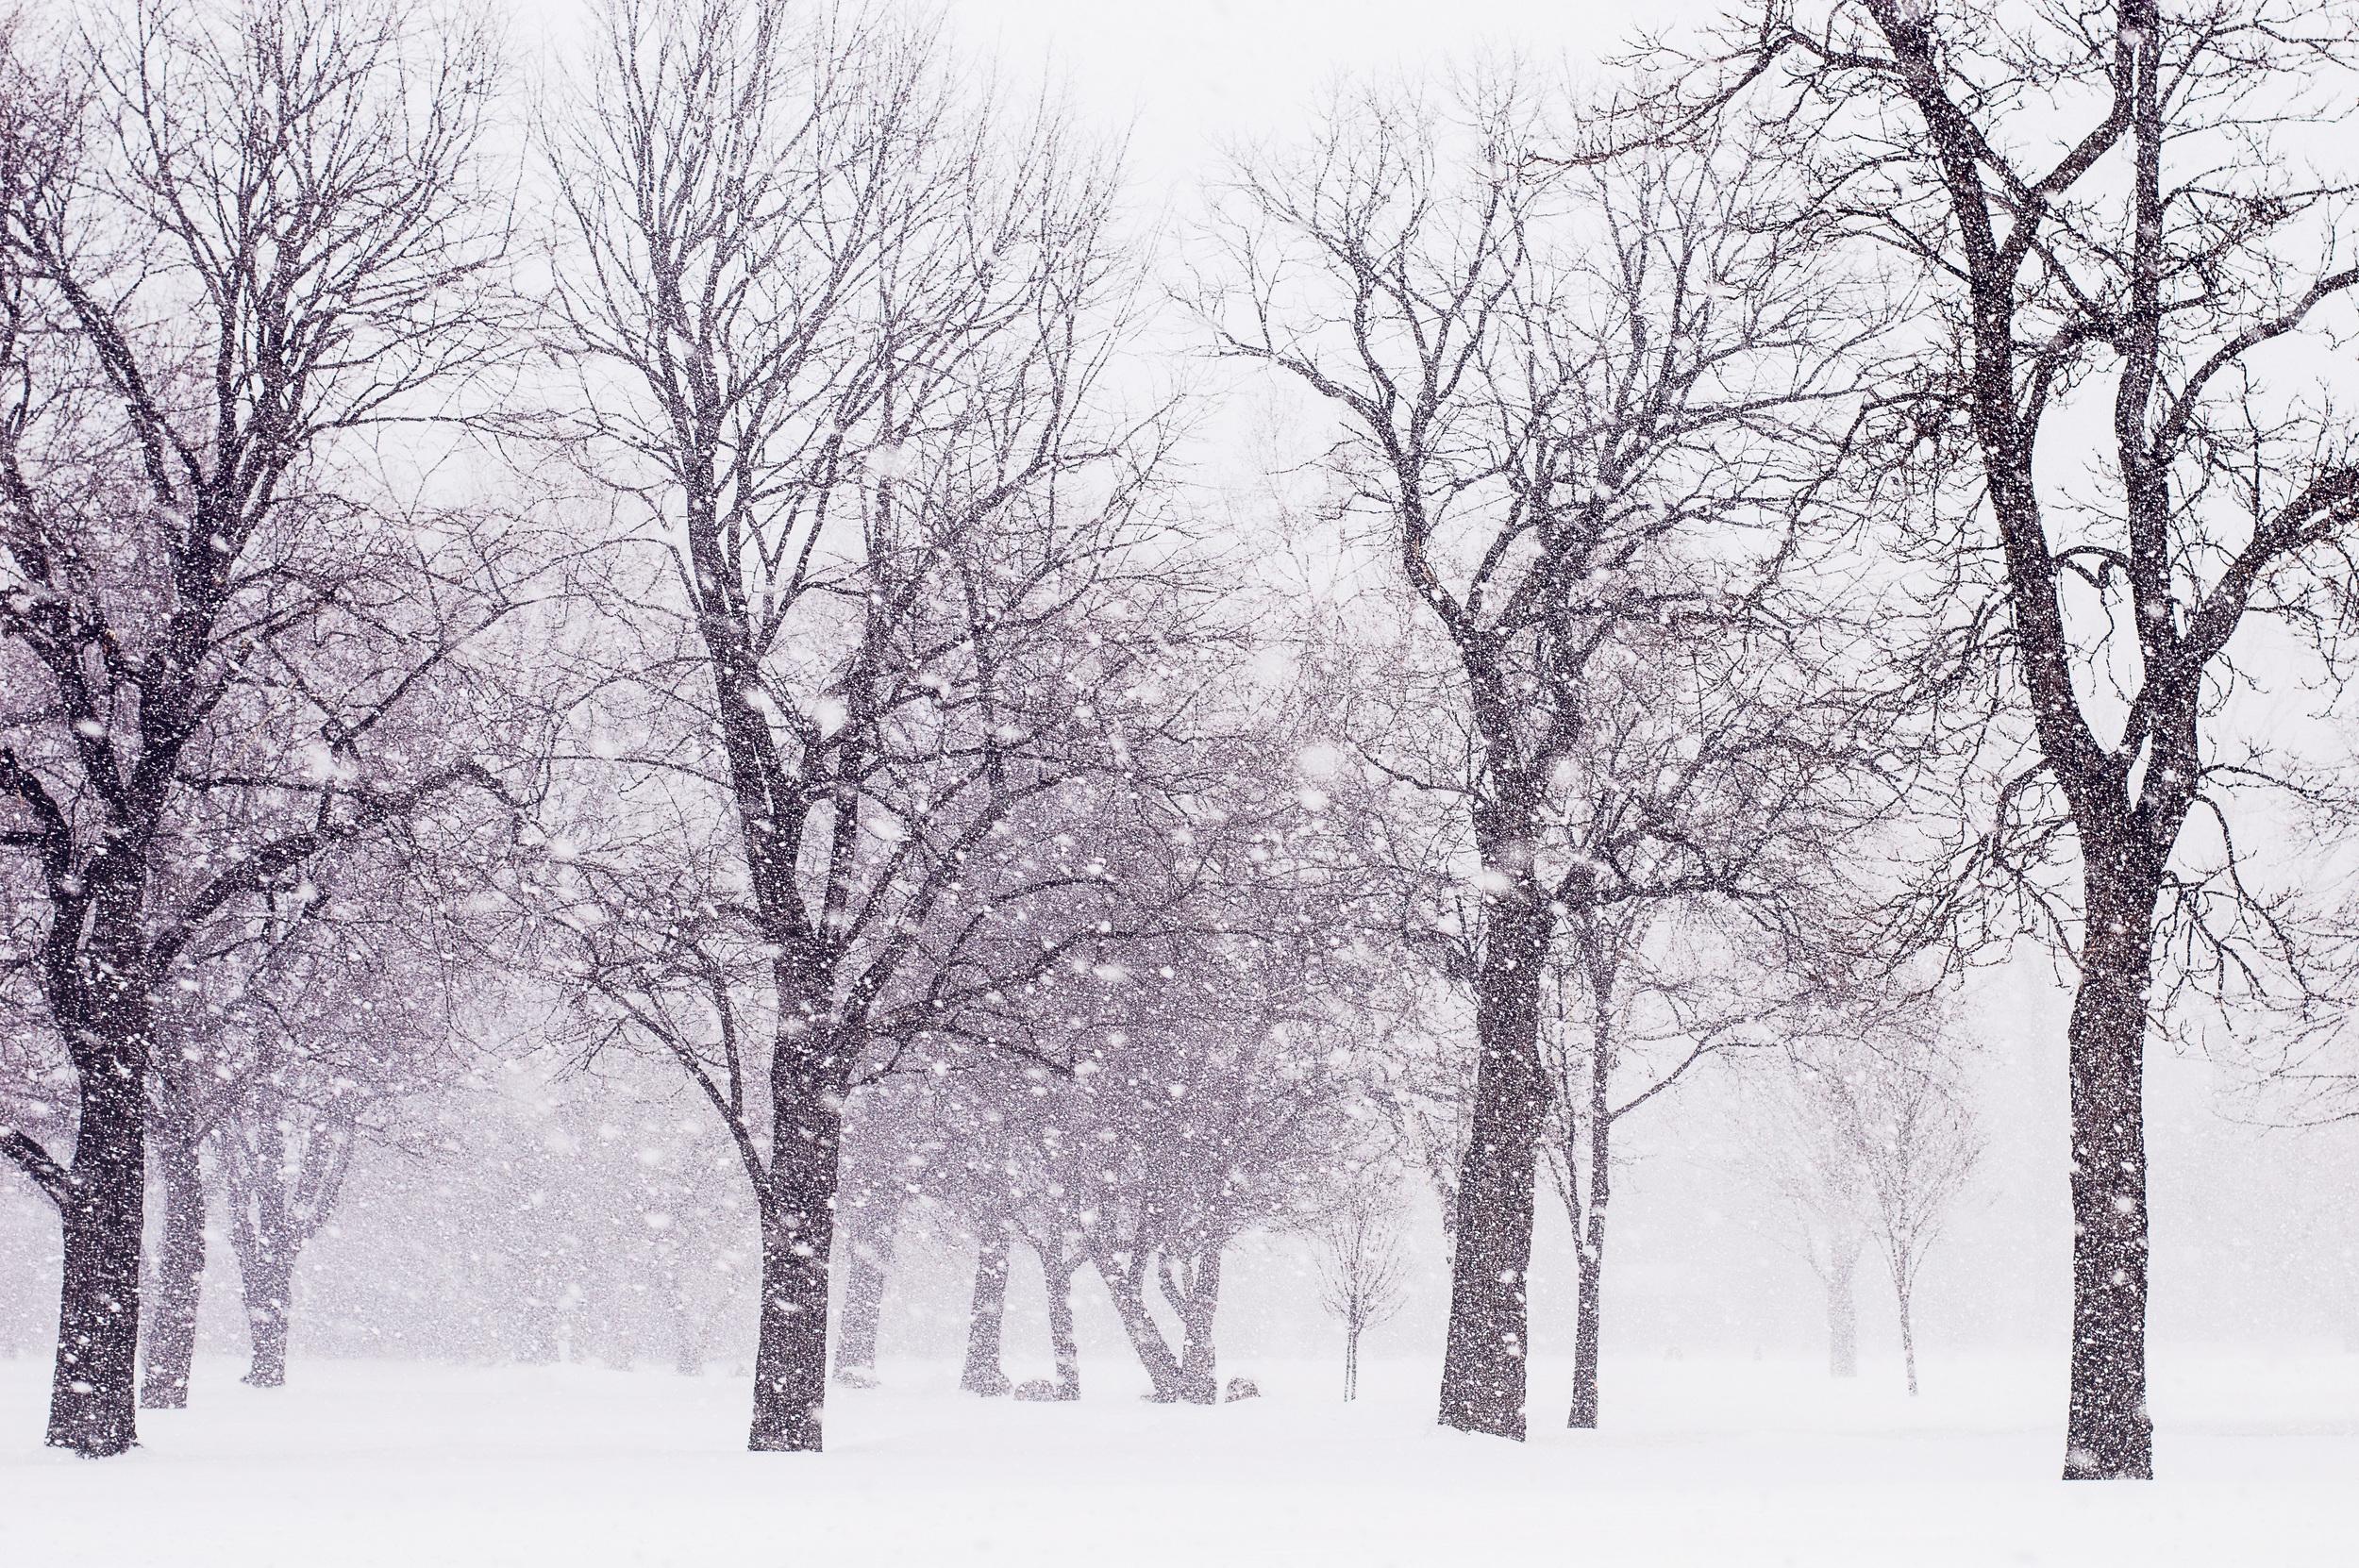 Endless Winter © Deena Roth Photography